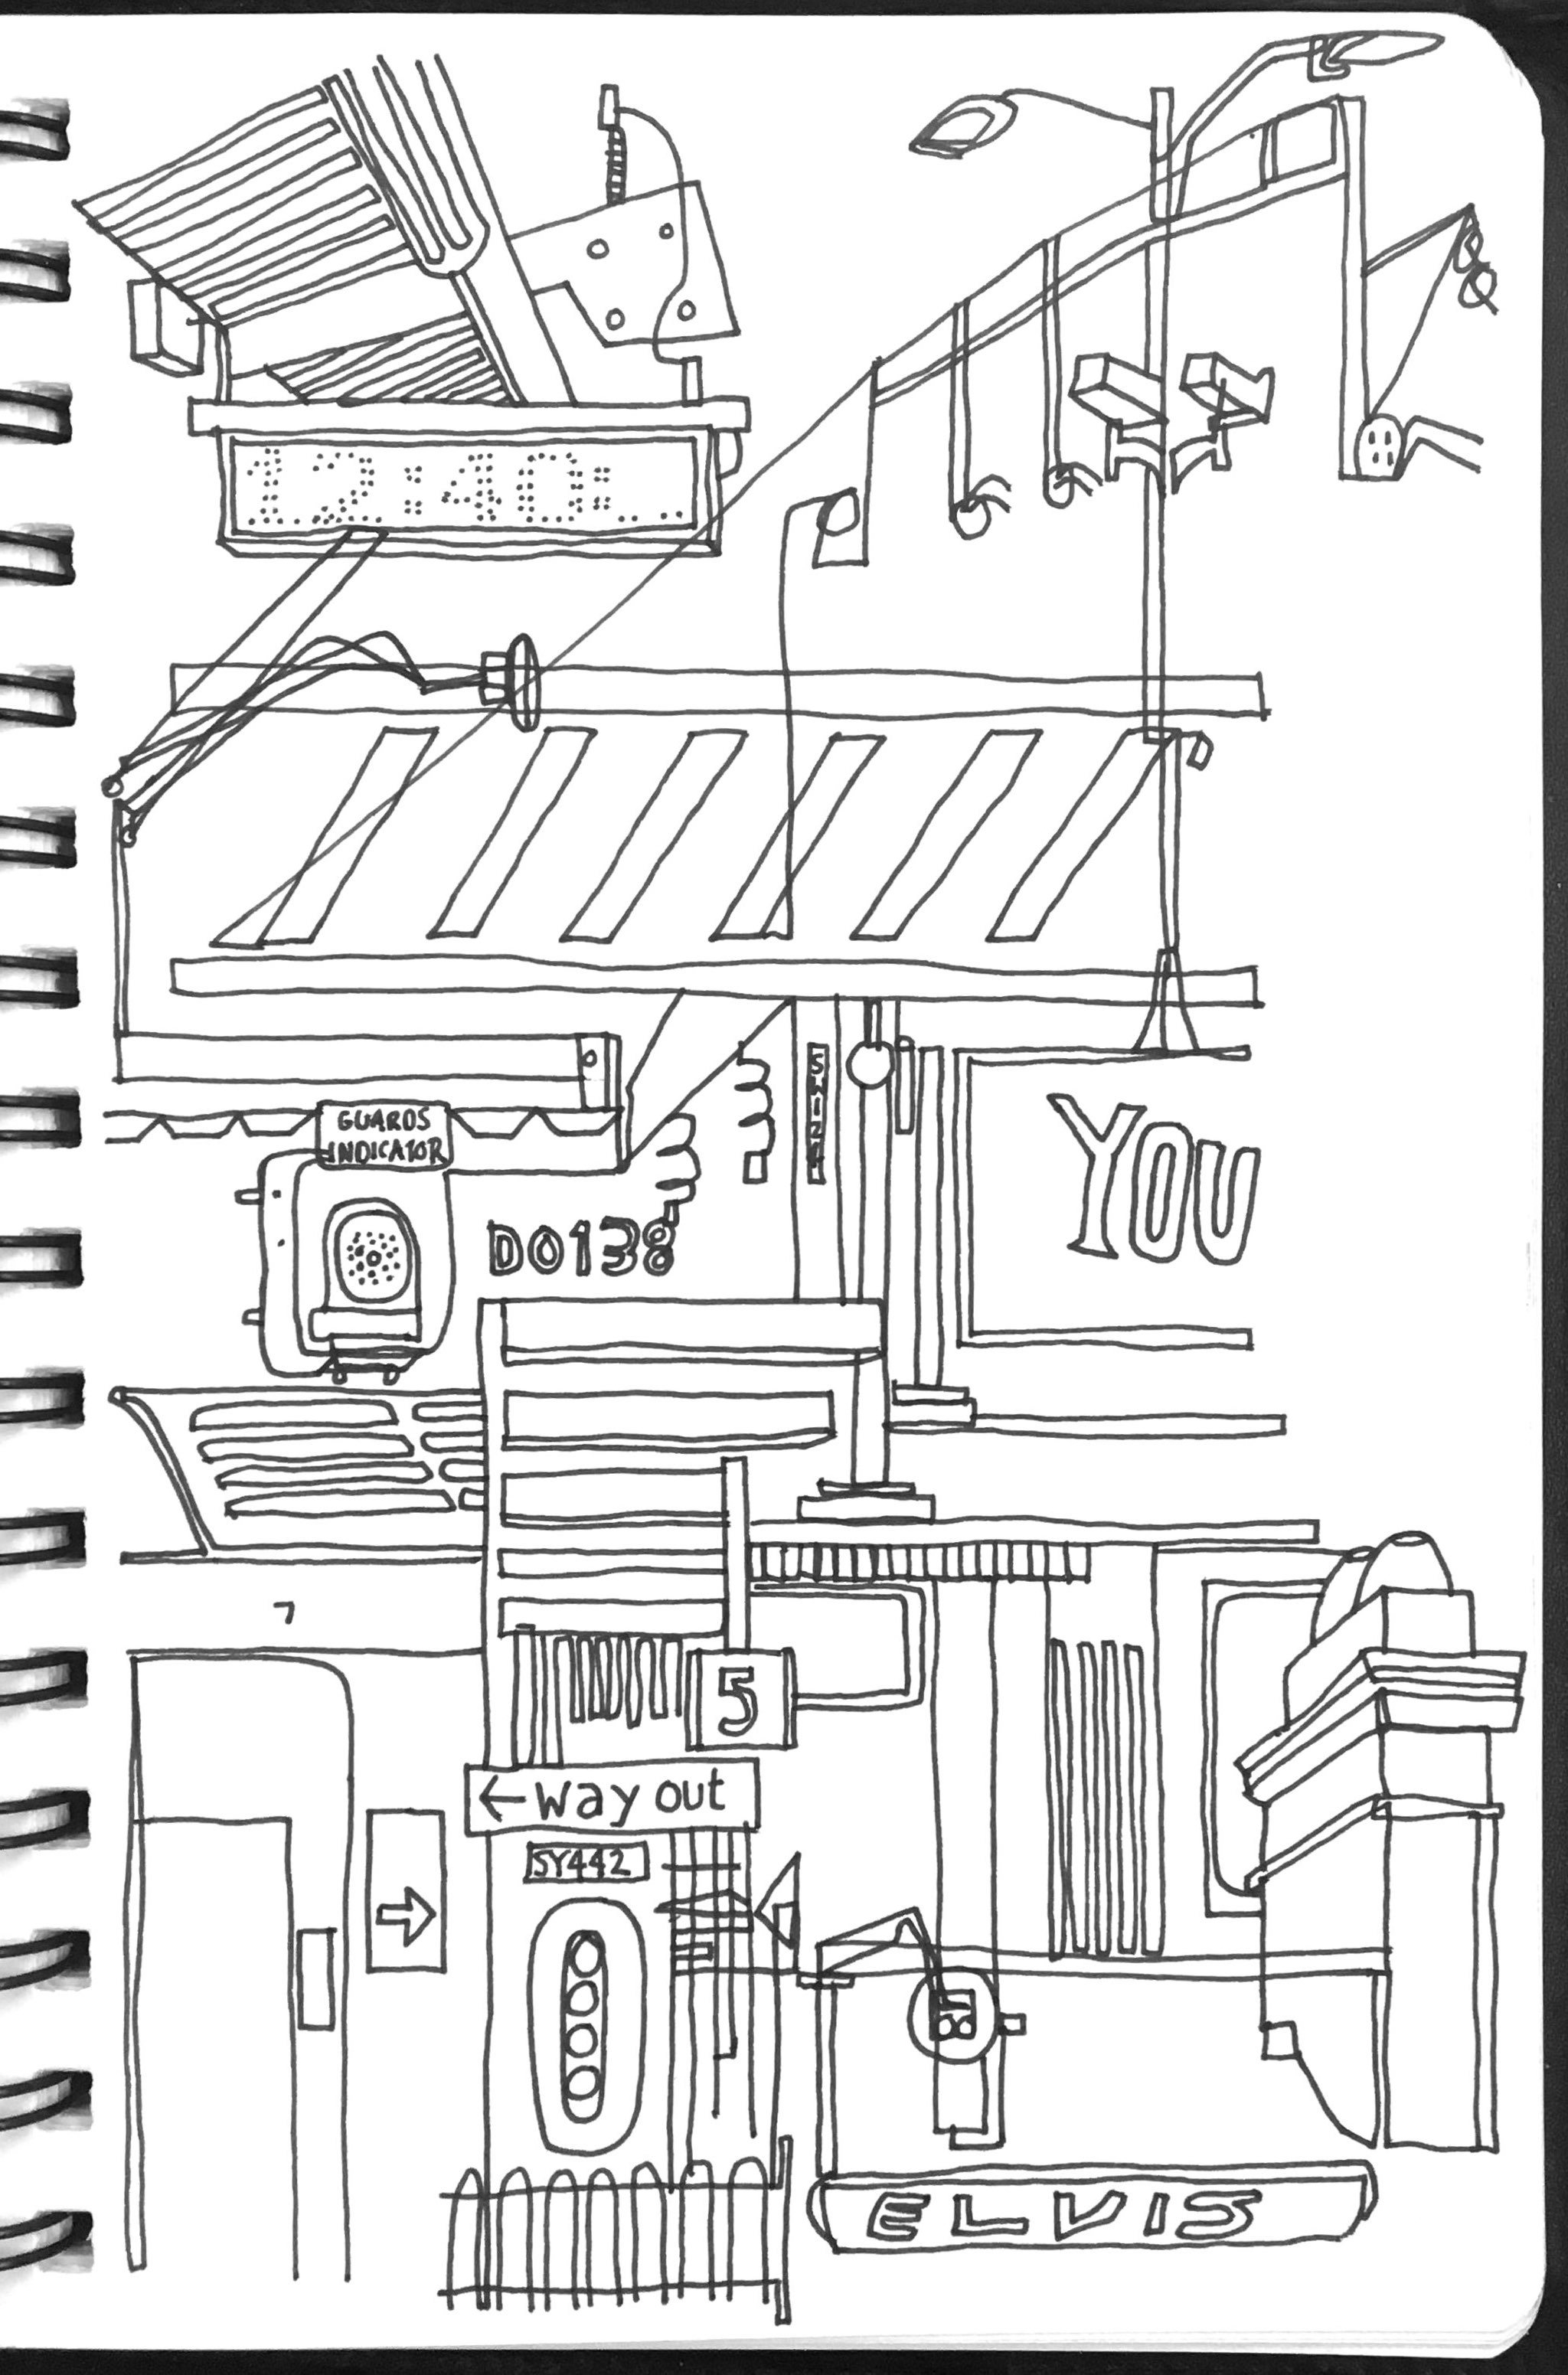 redfern station.jpg